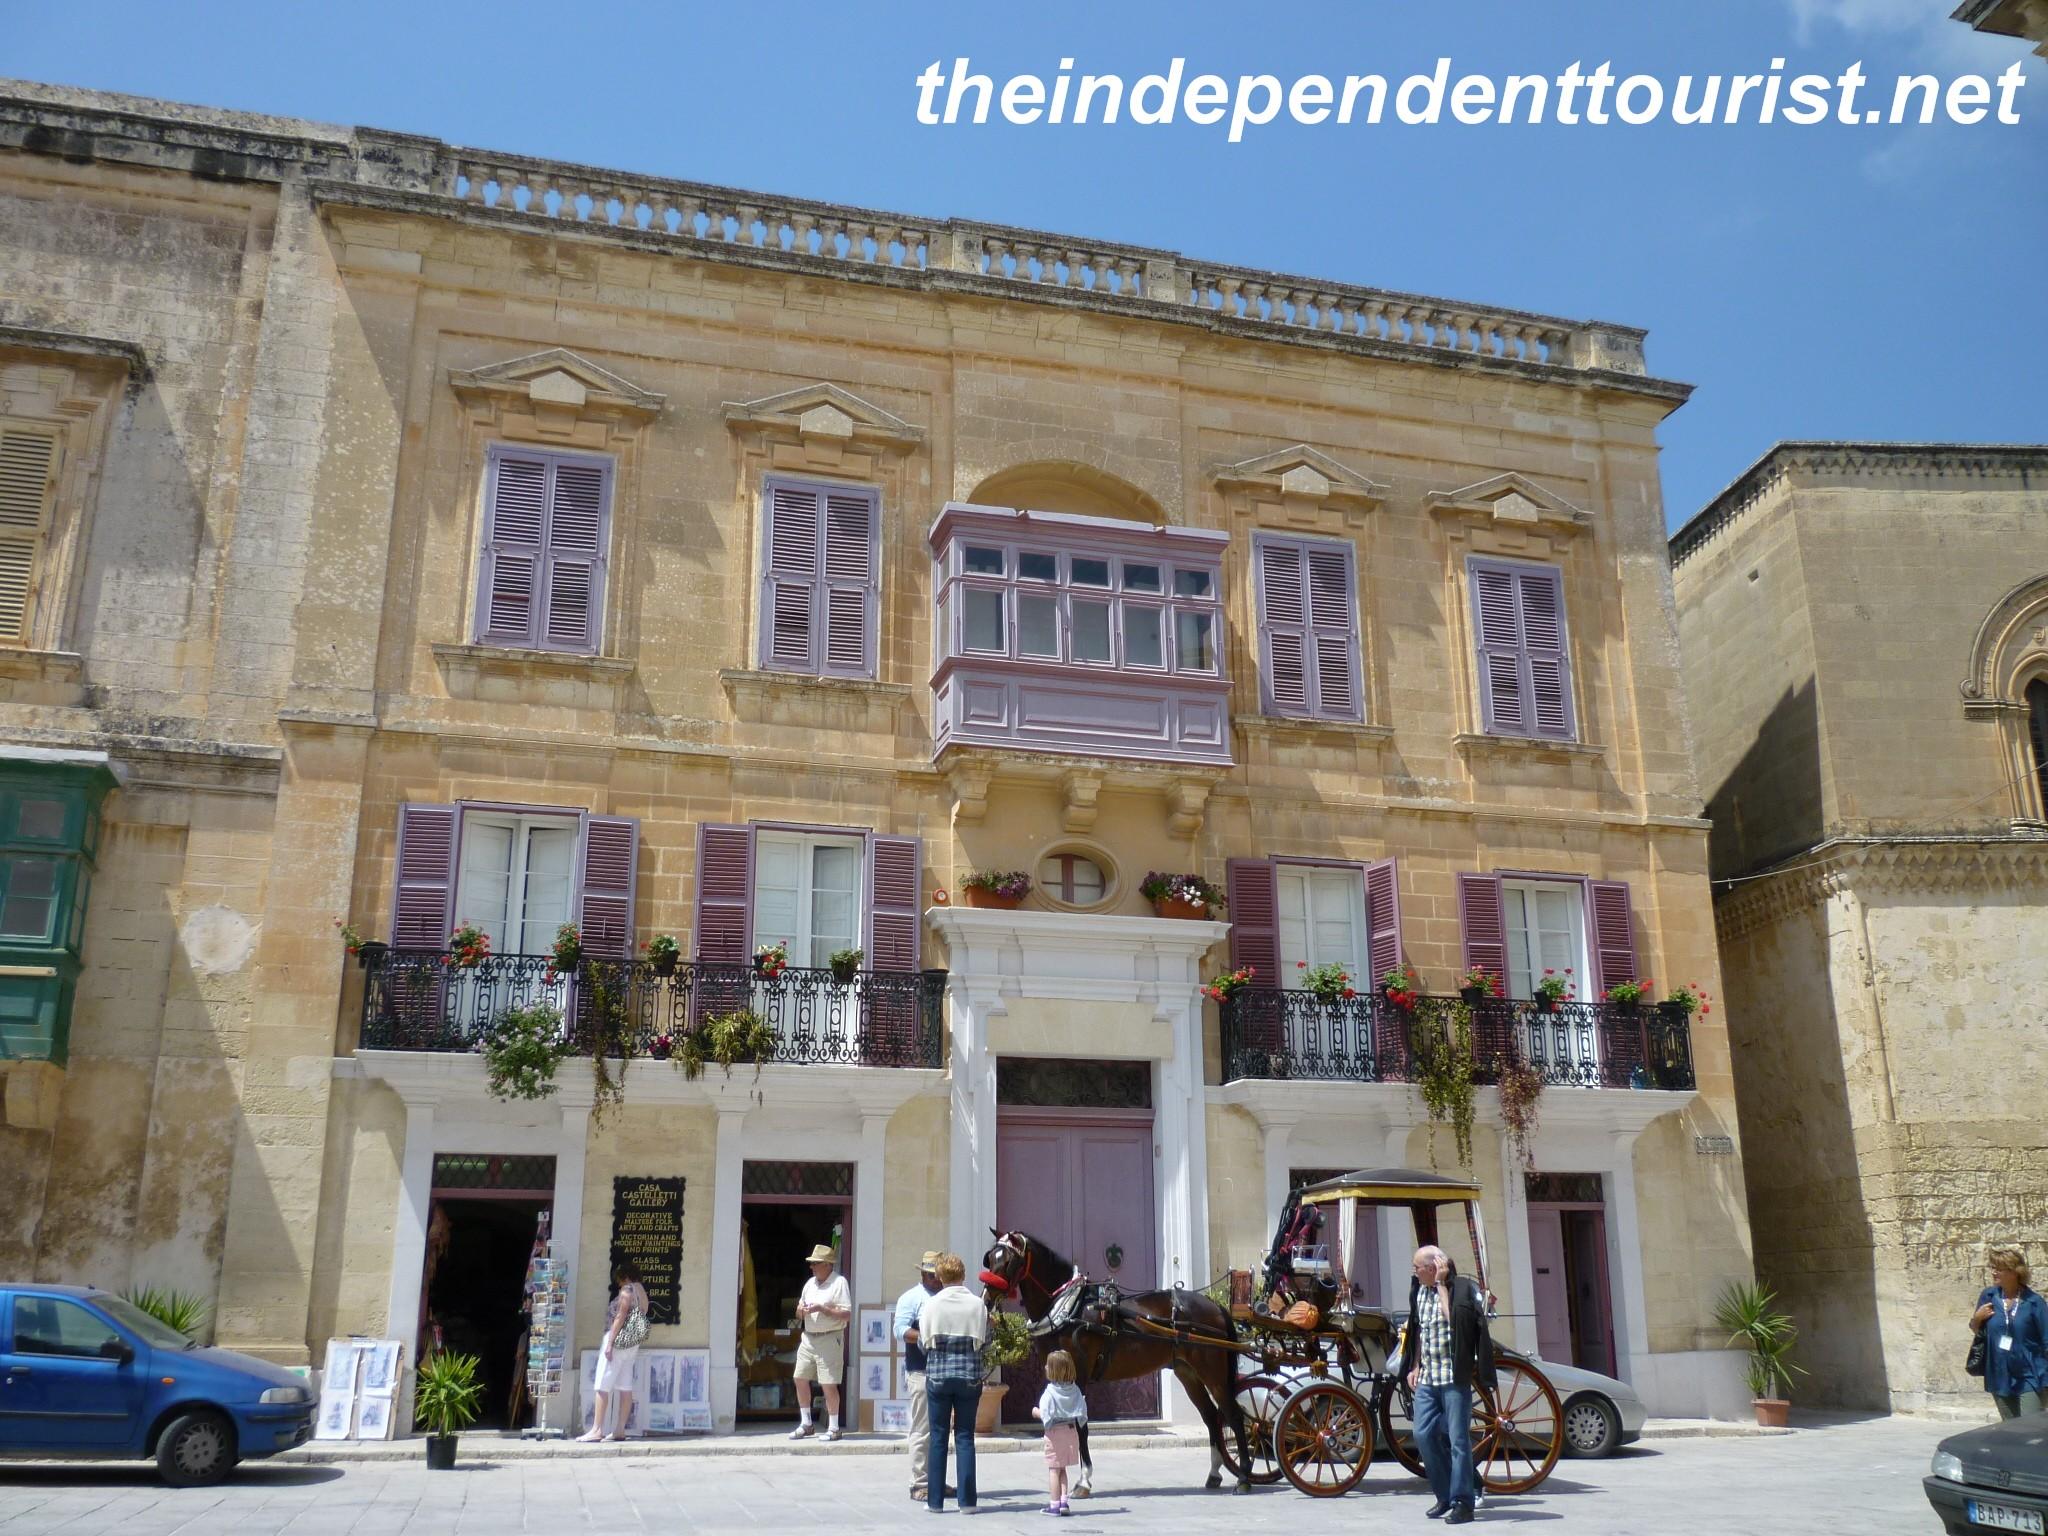 mdina street scene malta 2 the independent tourist